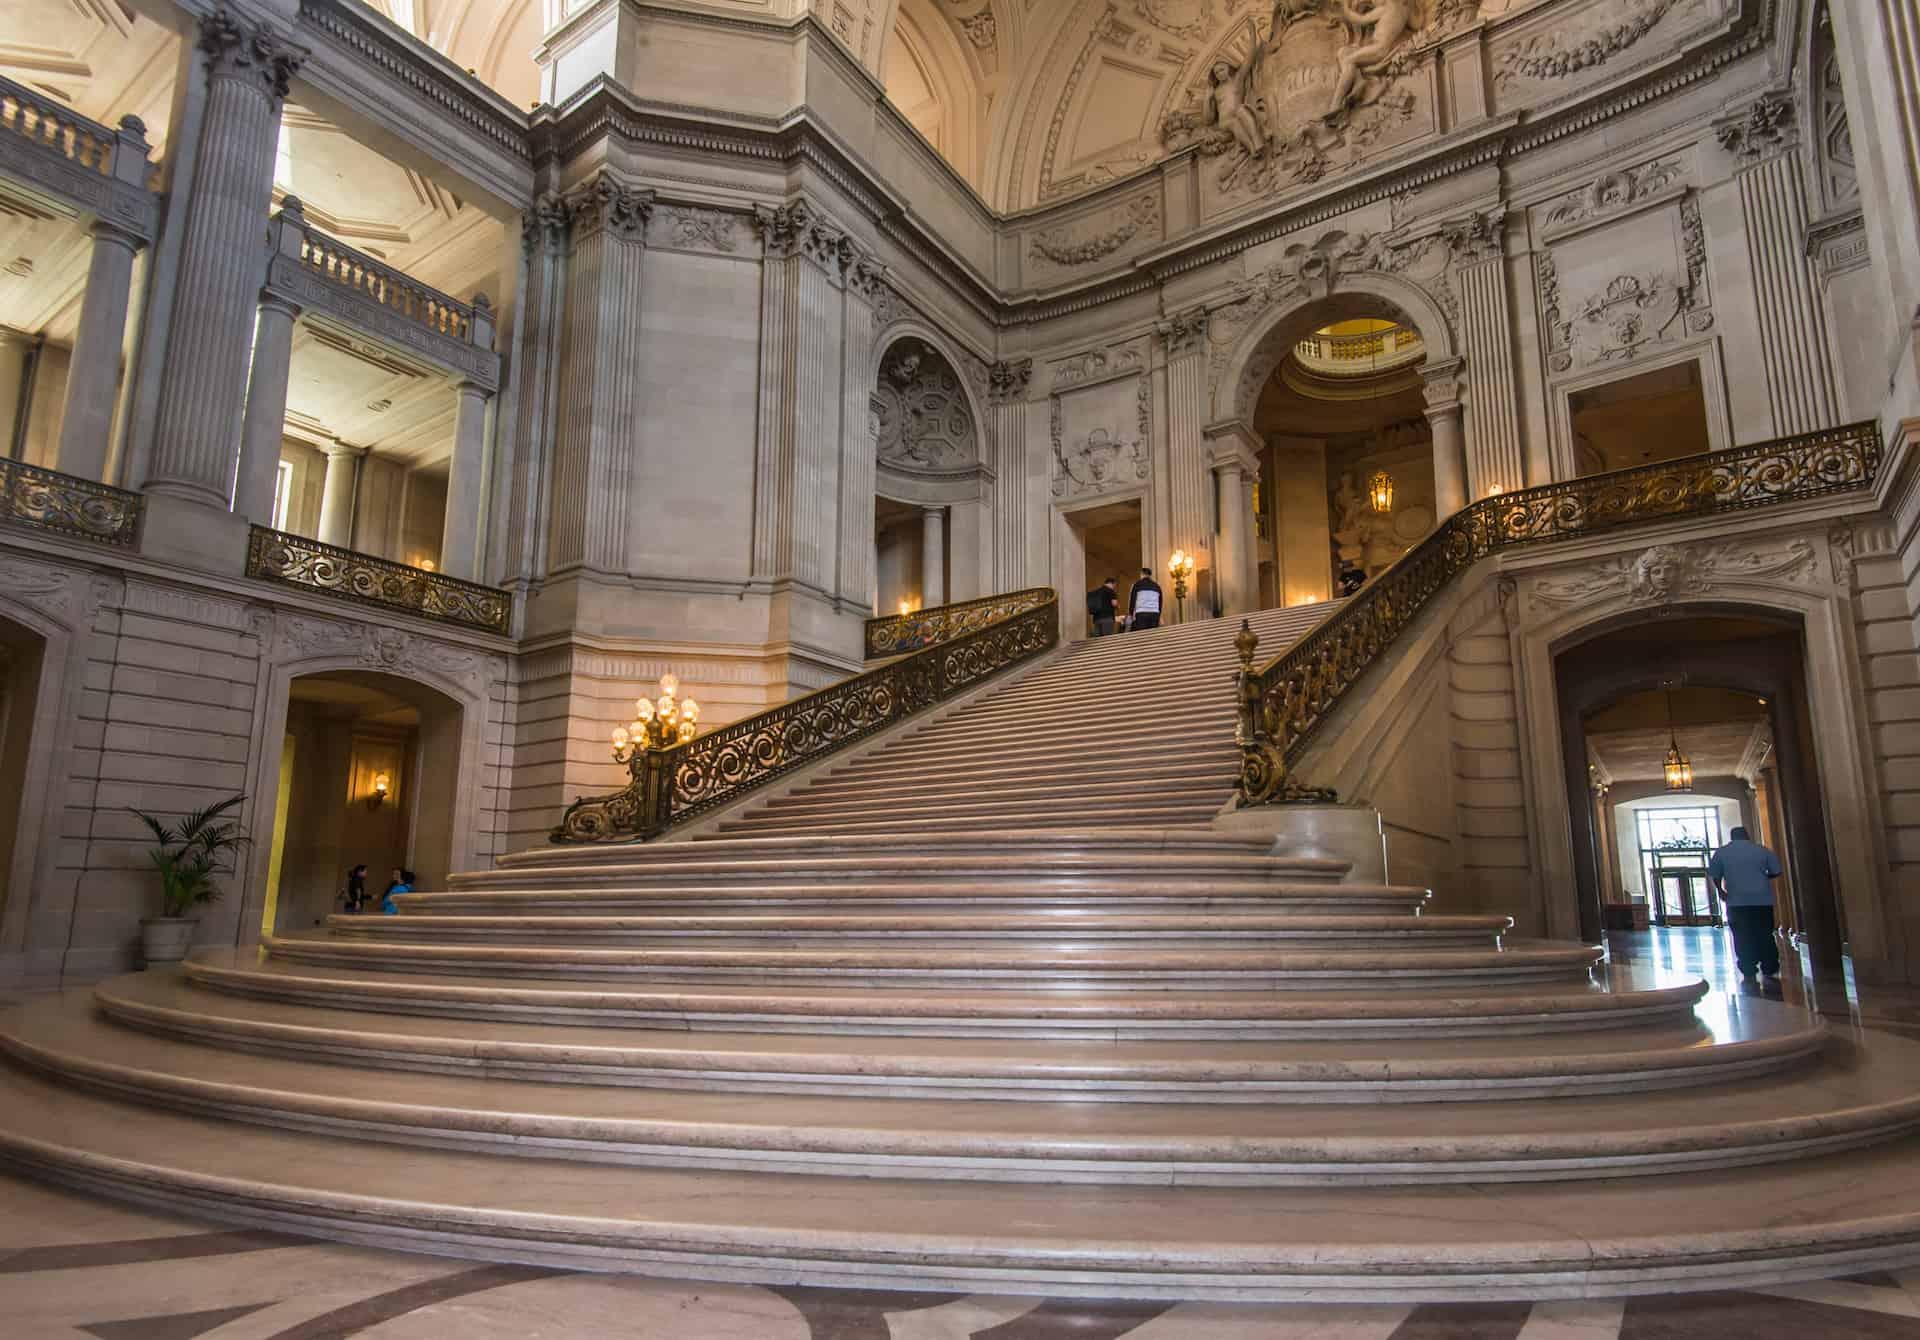 Rotunda and Staircase inside City Hall of San Francisco